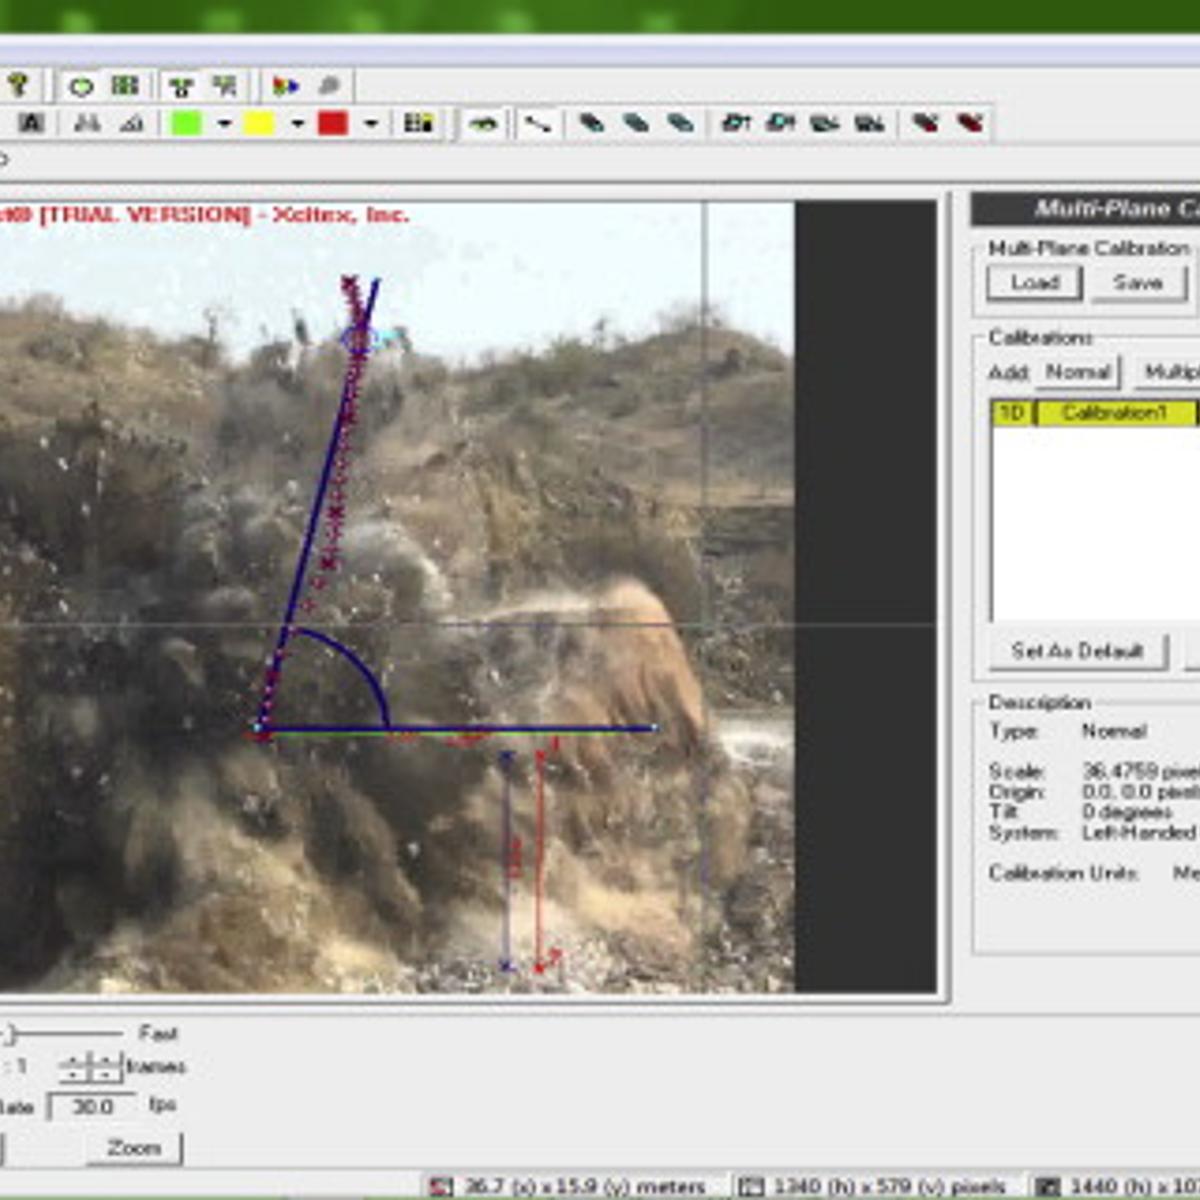 Kinovea Video Analysis For Mac